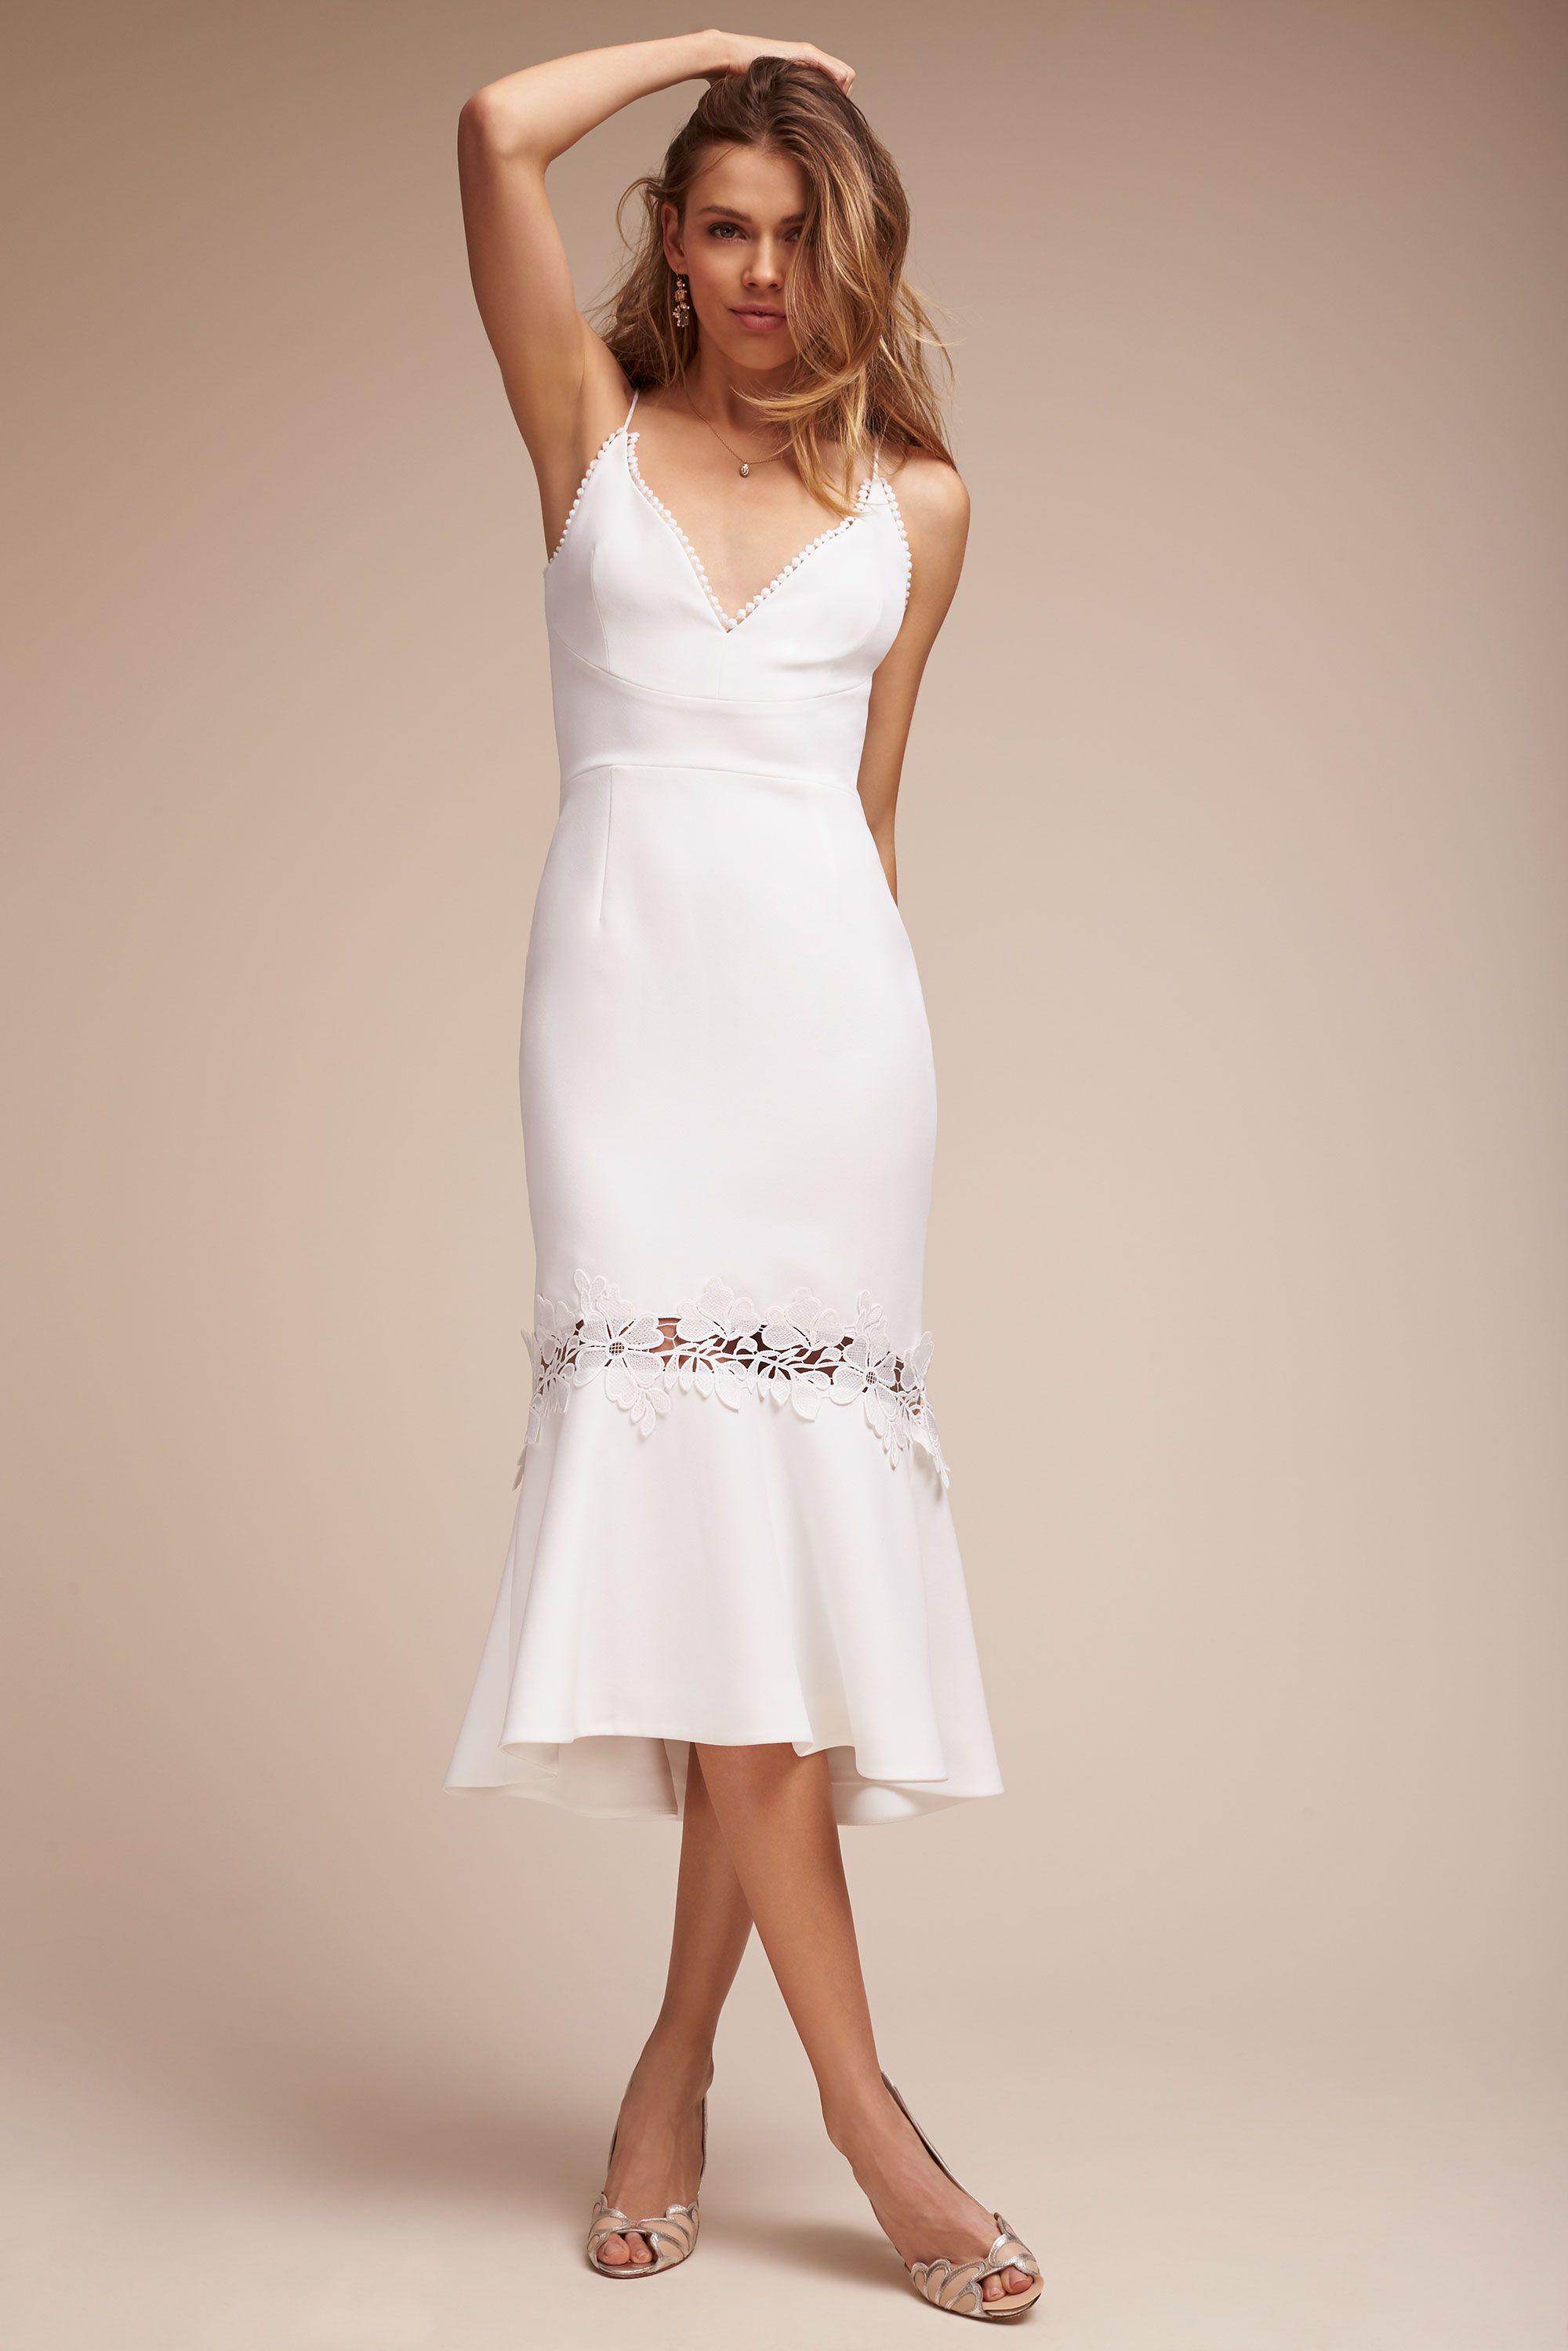 Wedding Bridal Shower Dresses wedding rehearsal reception bridal shower dresses bhldn amina dress dress